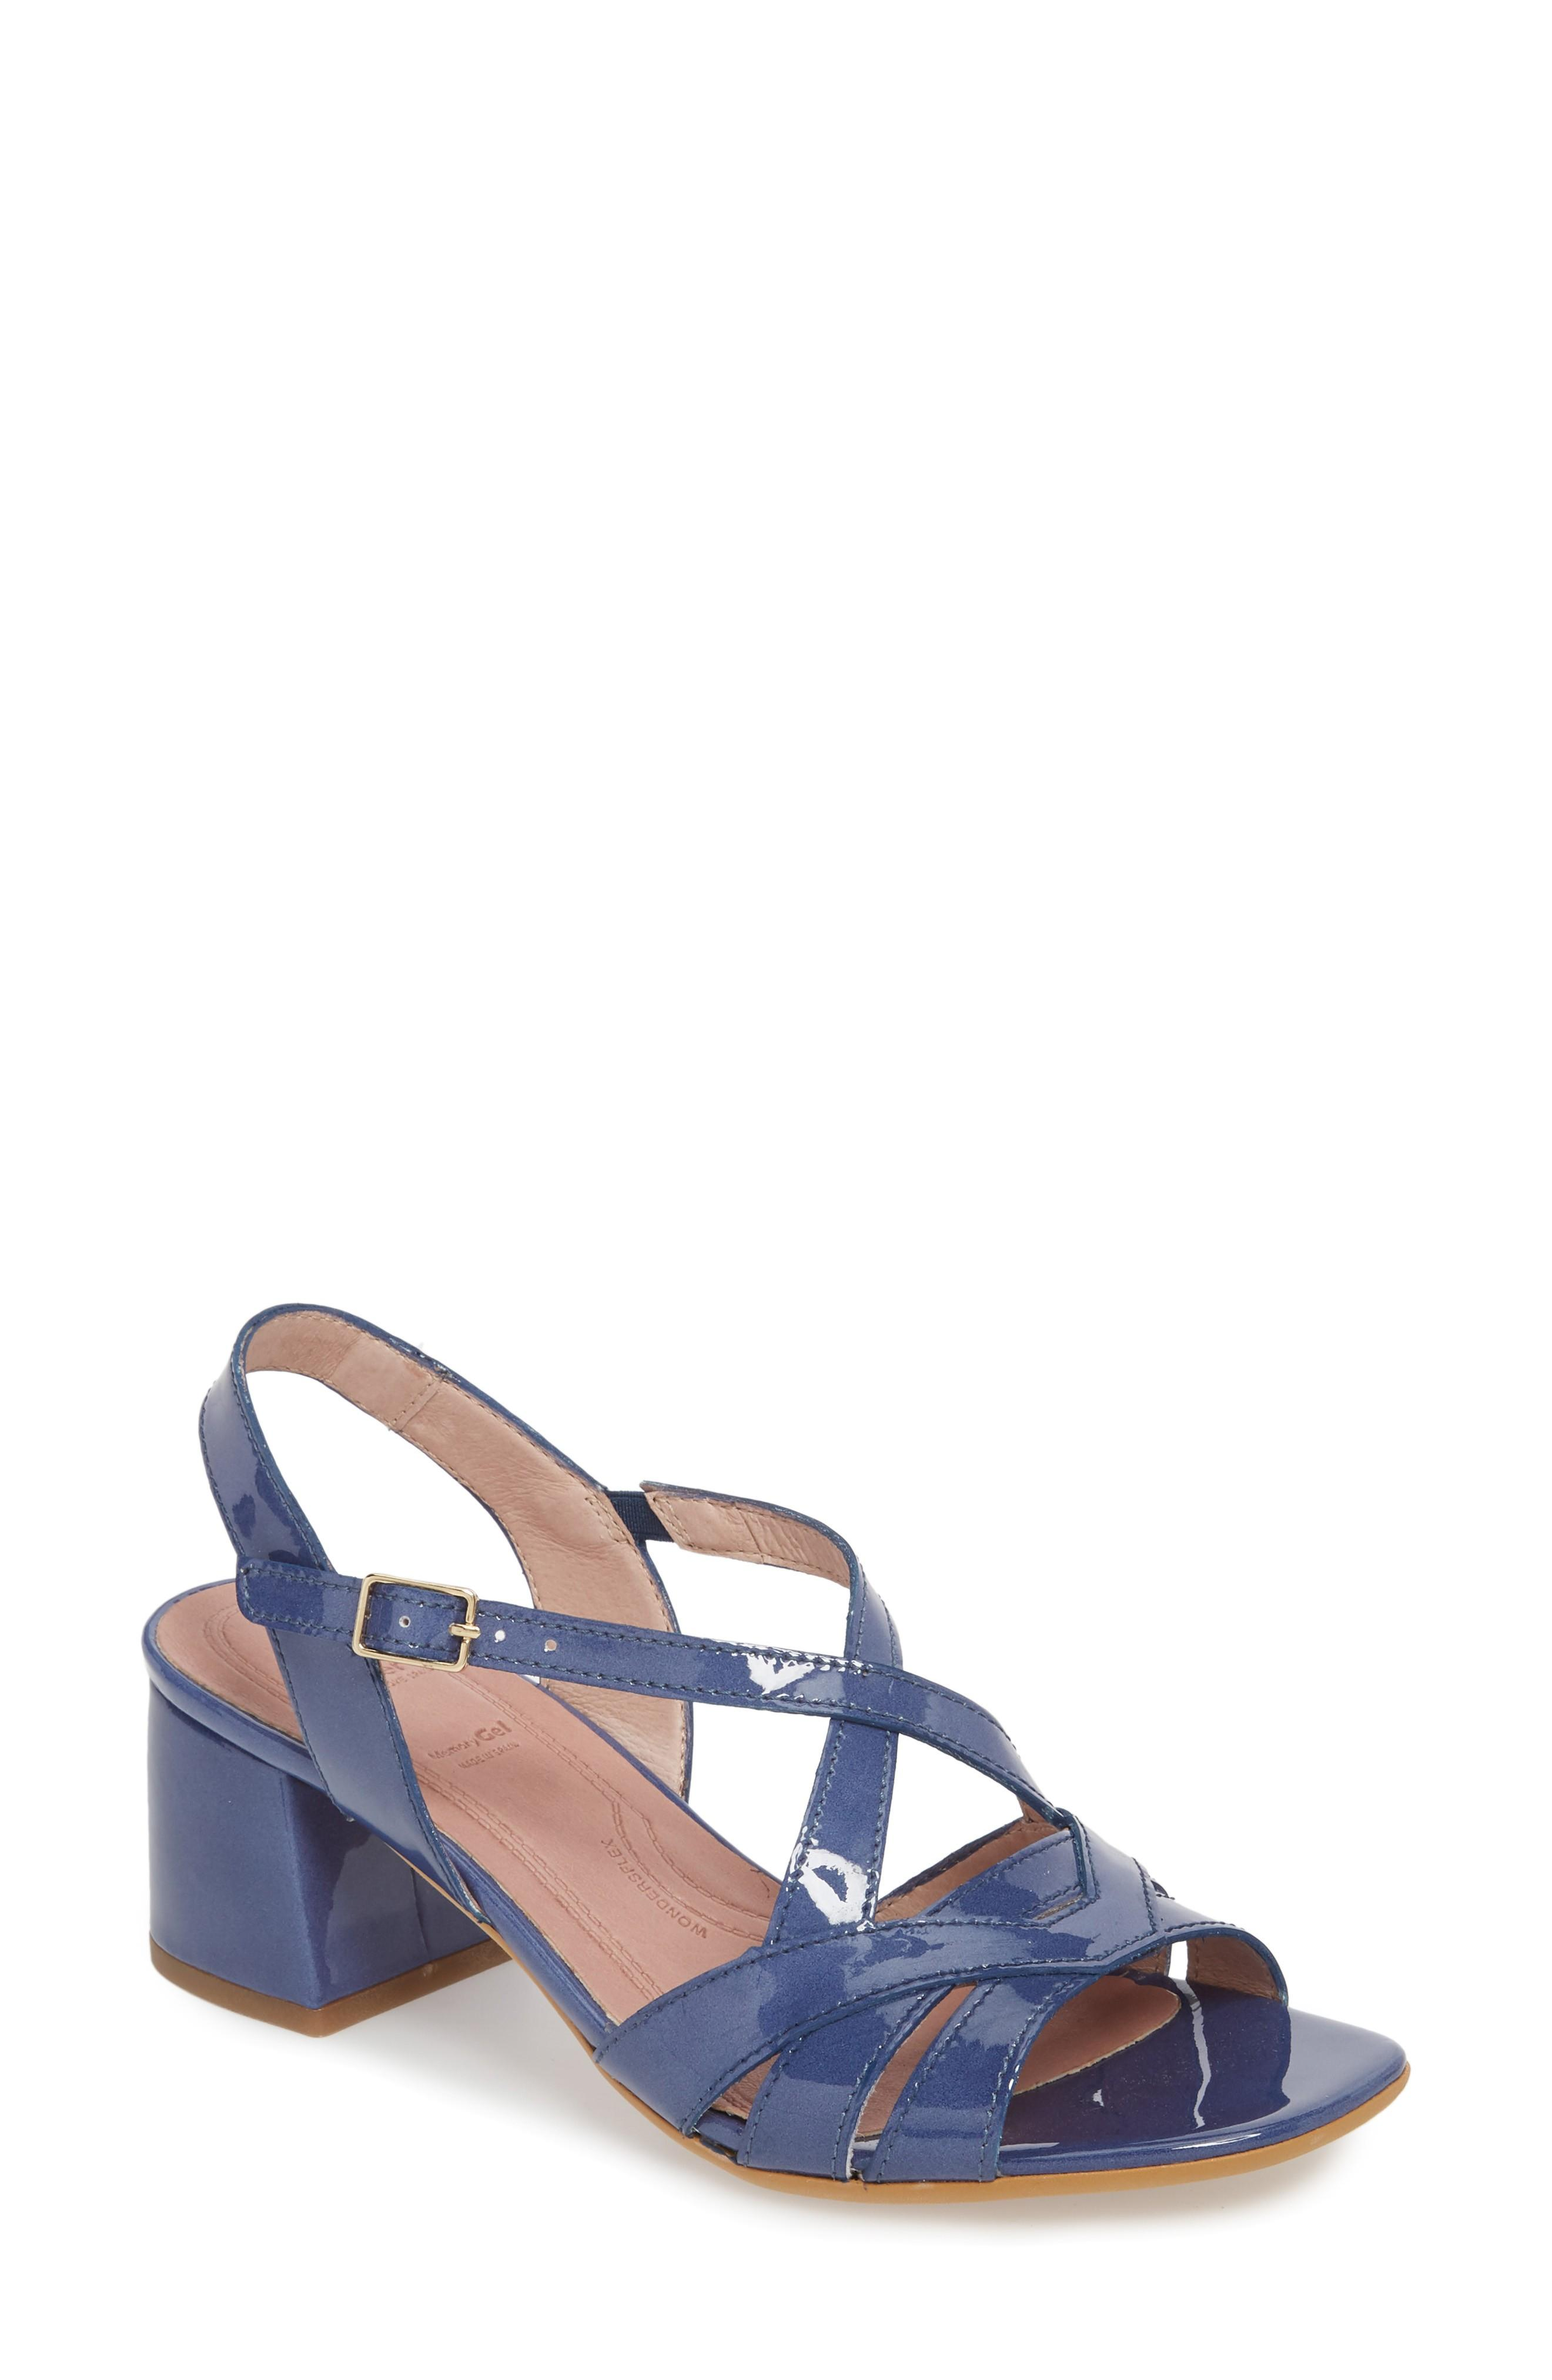 Wonders Block Heel Sandal In Jean Patent Leather